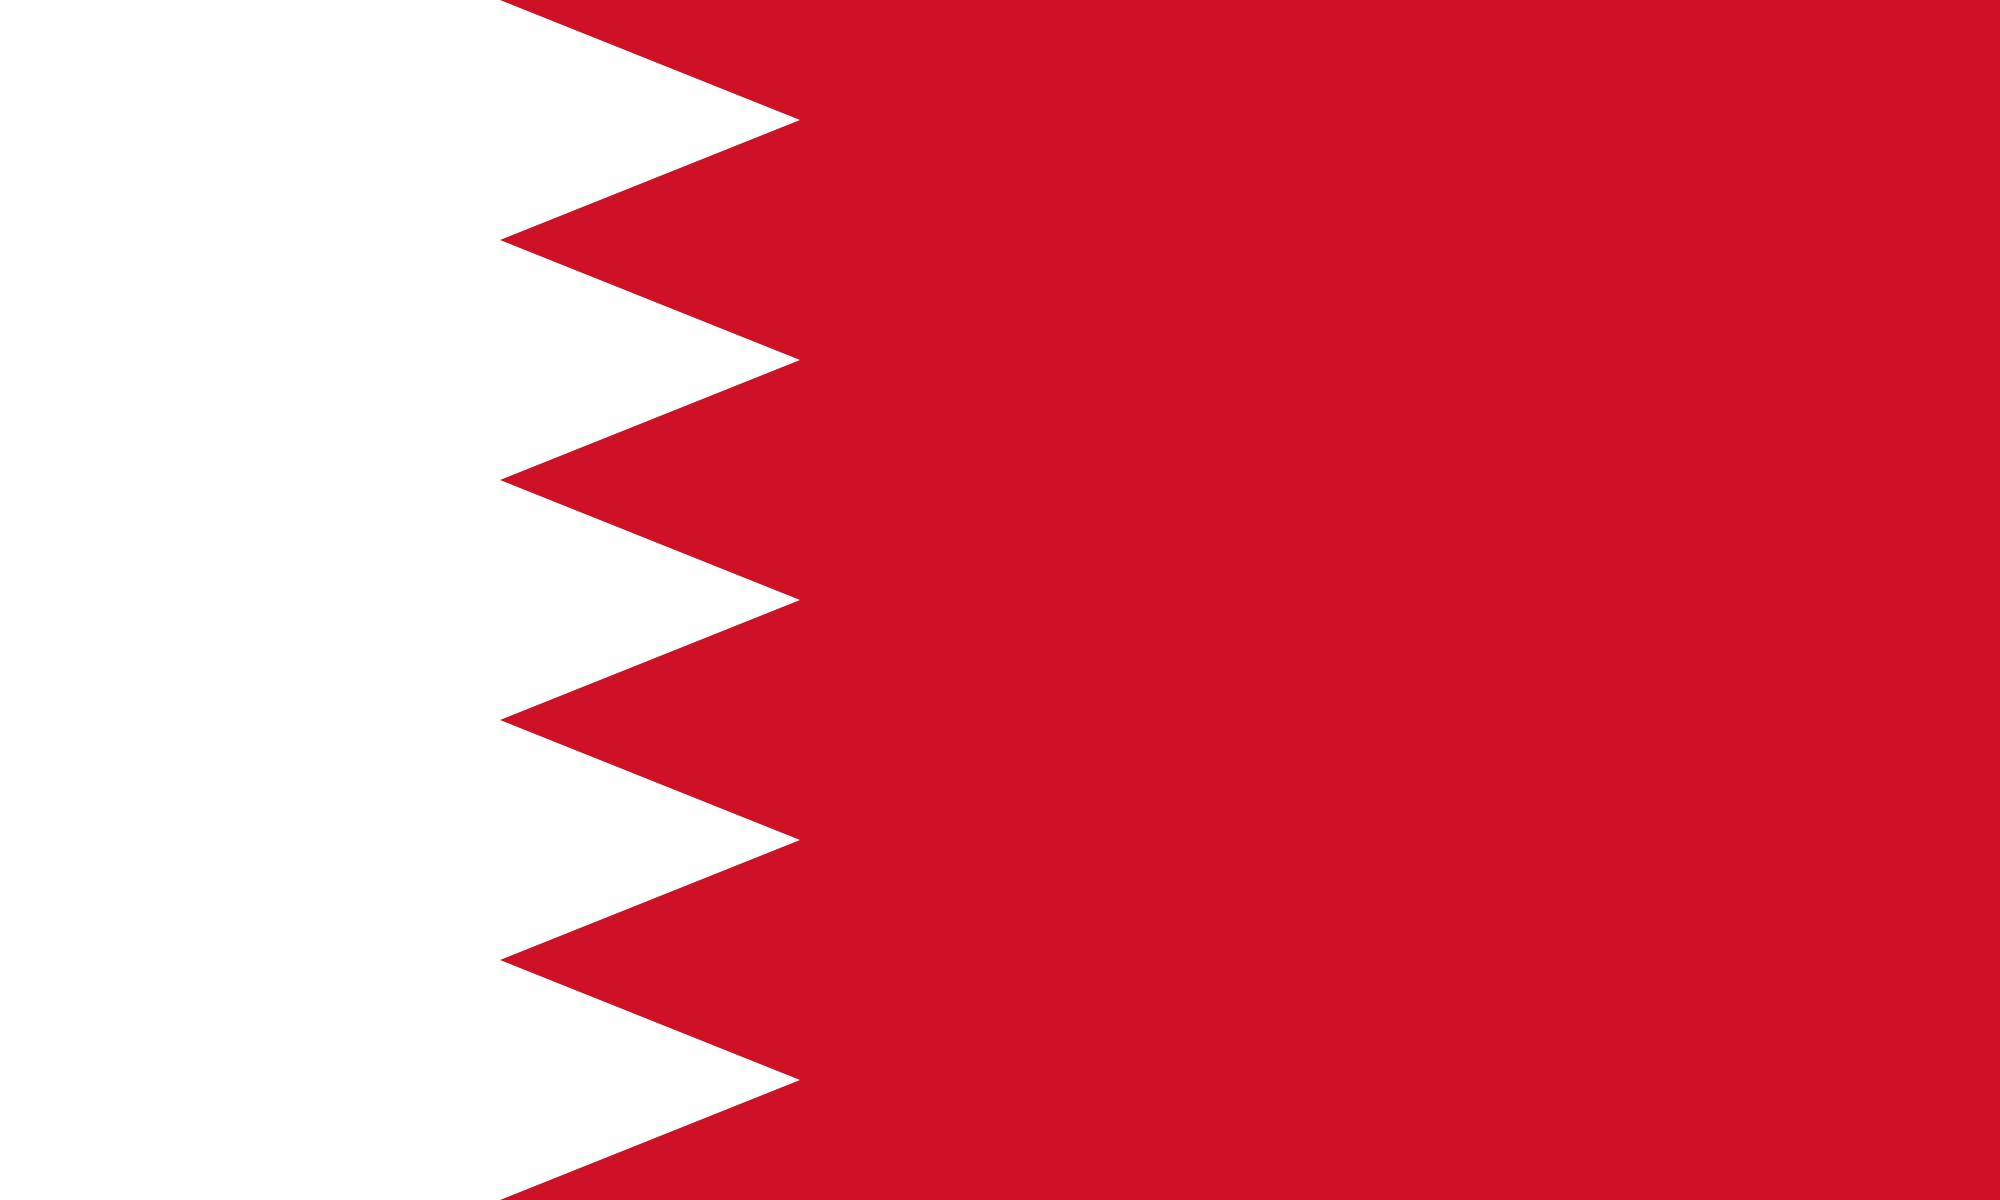 Bahrain PNG